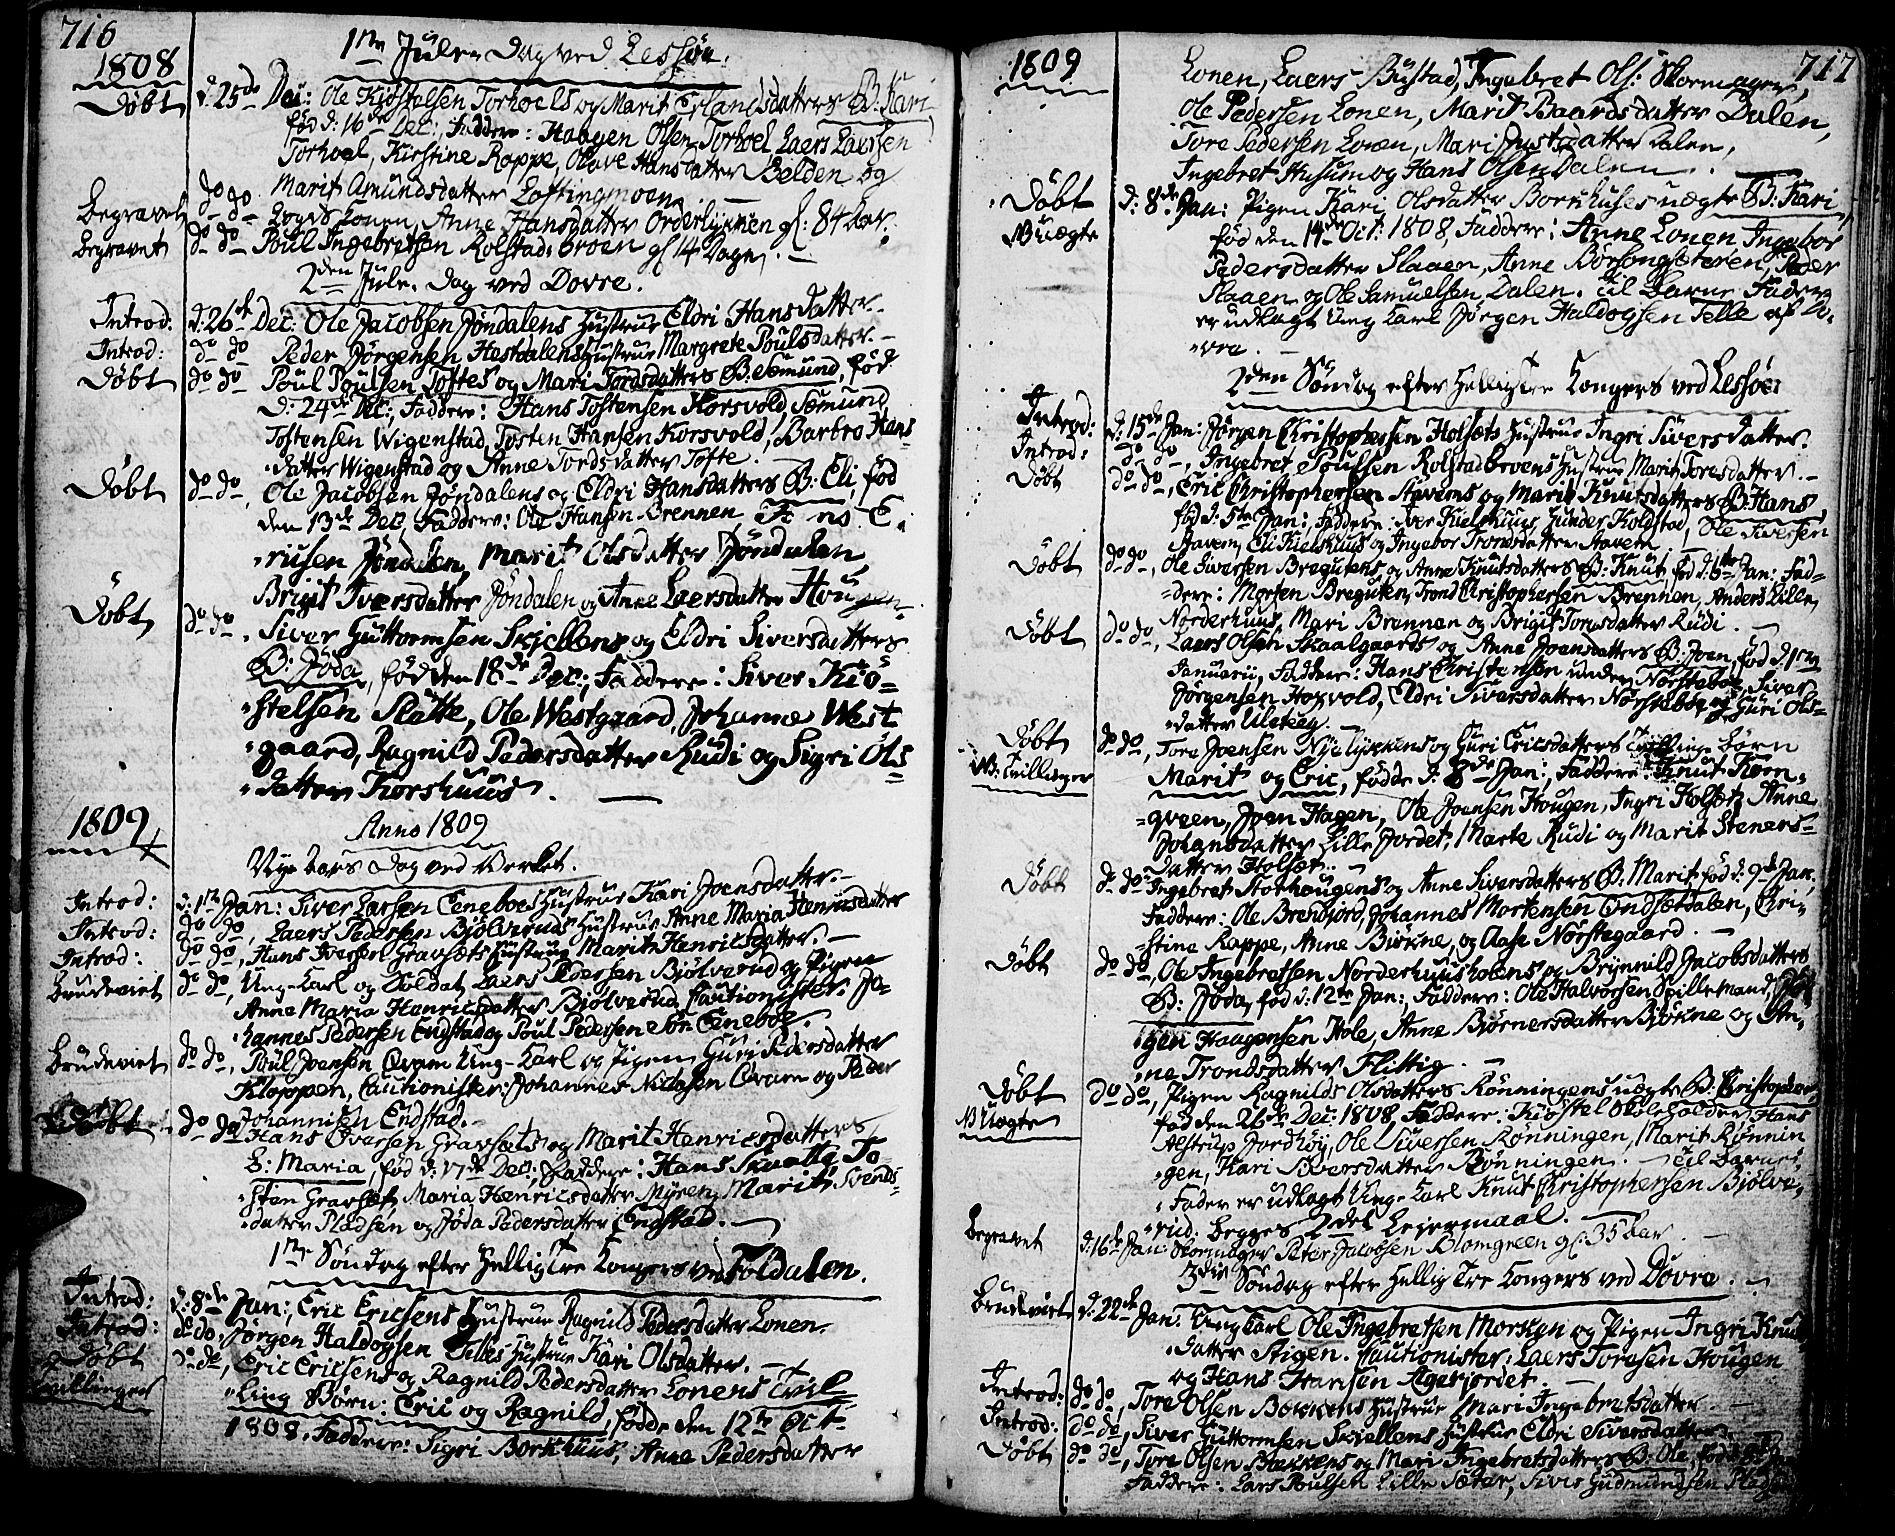 SAH, Lesja prestekontor, Ministerialbok nr. 3, 1777-1819, s. 716-717